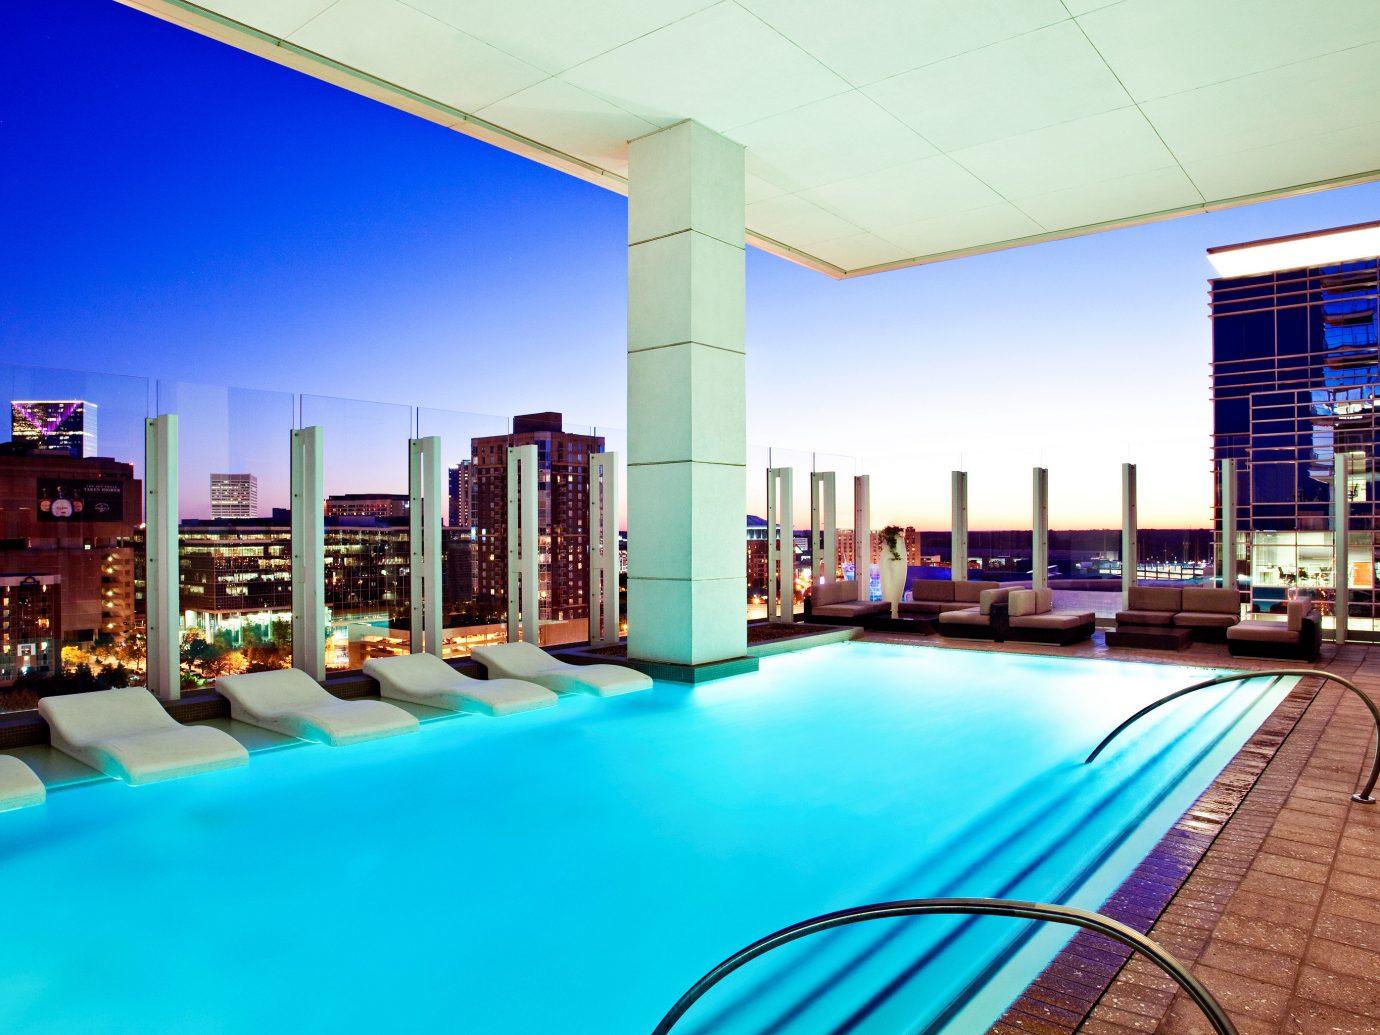 Hotels Lounge Luxury Modern Pool swimming pool leisure property condominium estate Resort interior design real estate convention center